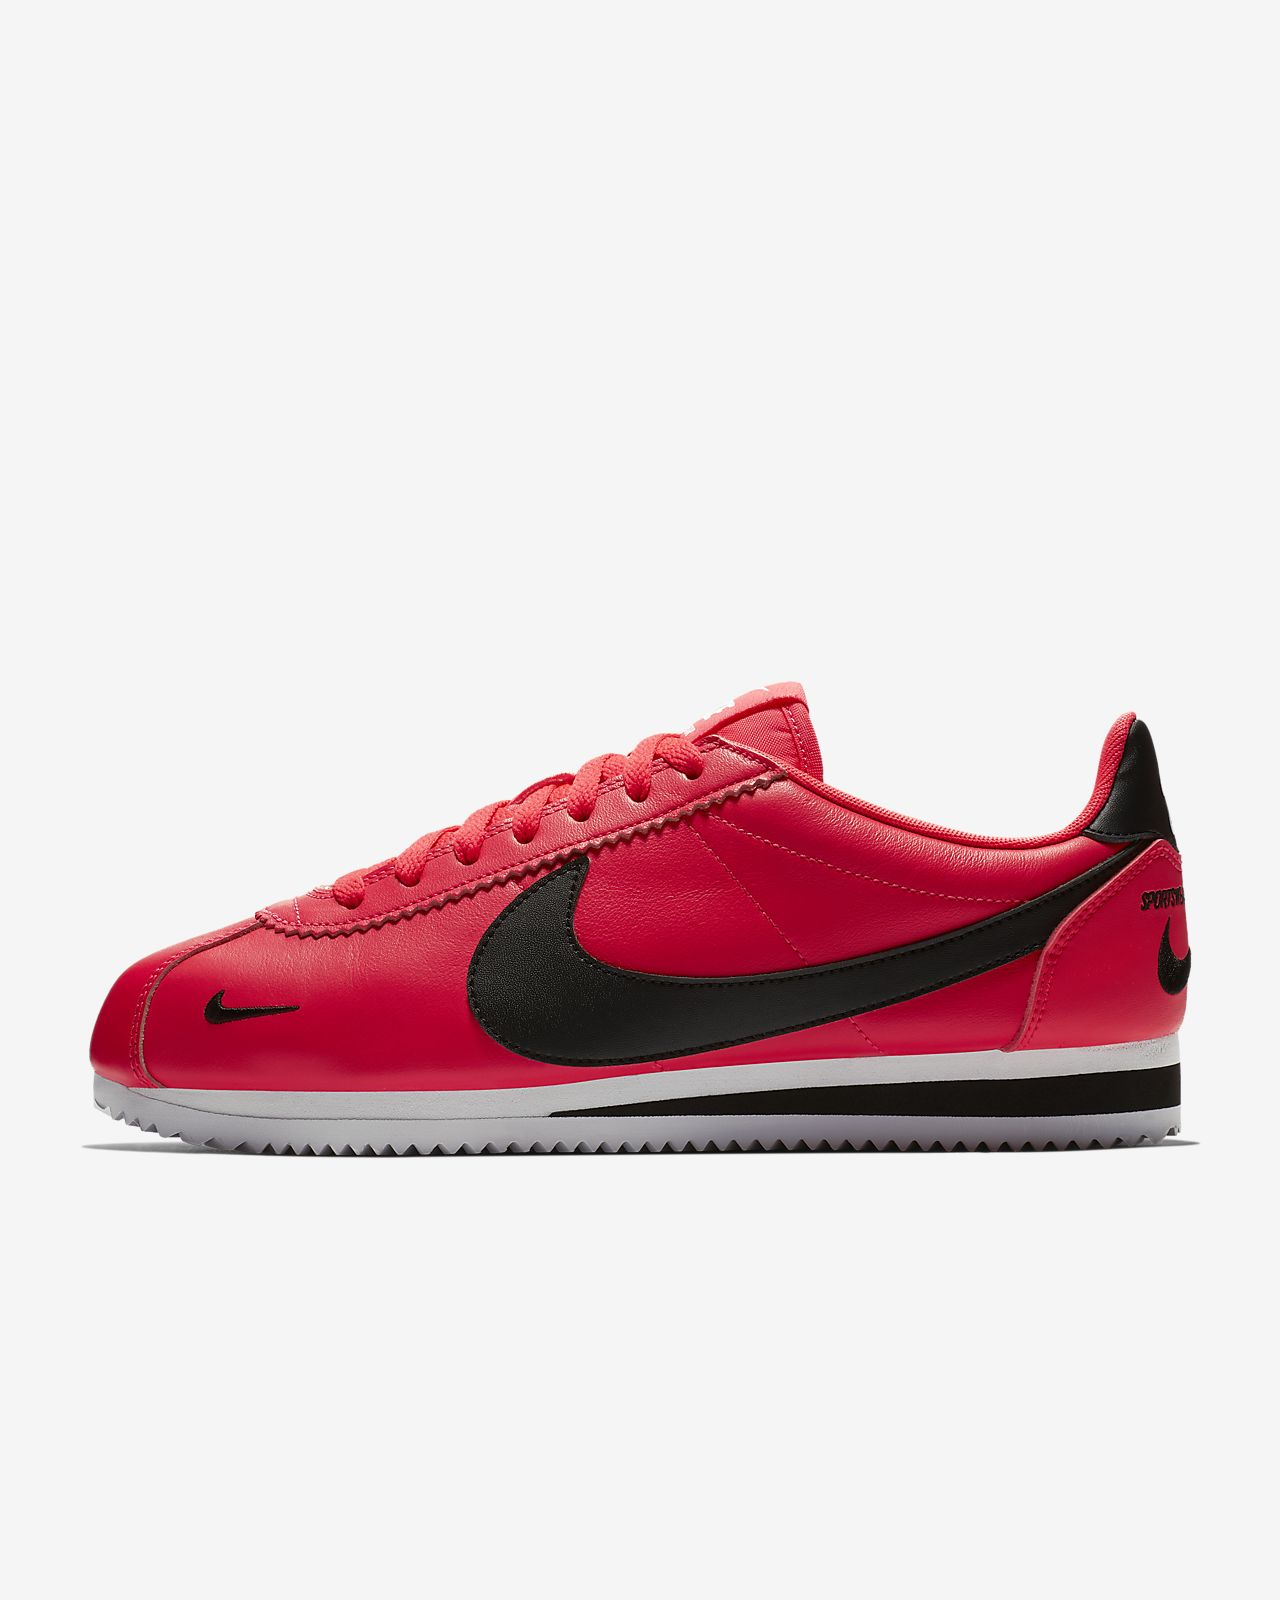 9df374c6 Кроссовки унисекс Nike Classic Cortez Premium. Nike.com RU